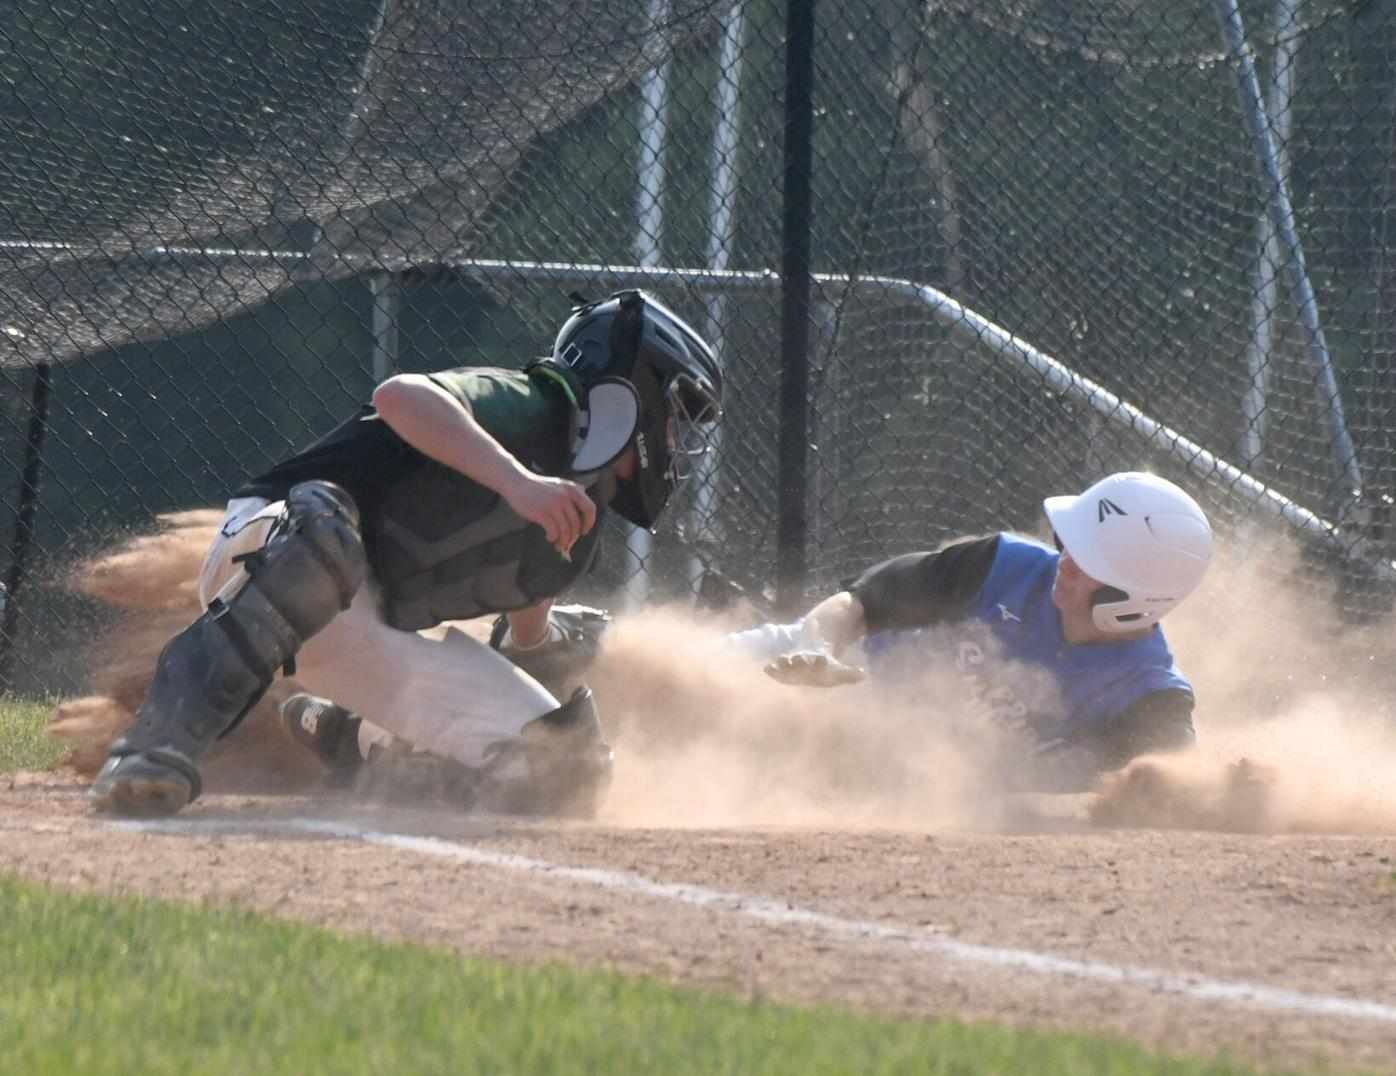 052621 SU EN Baseball 01.jpg